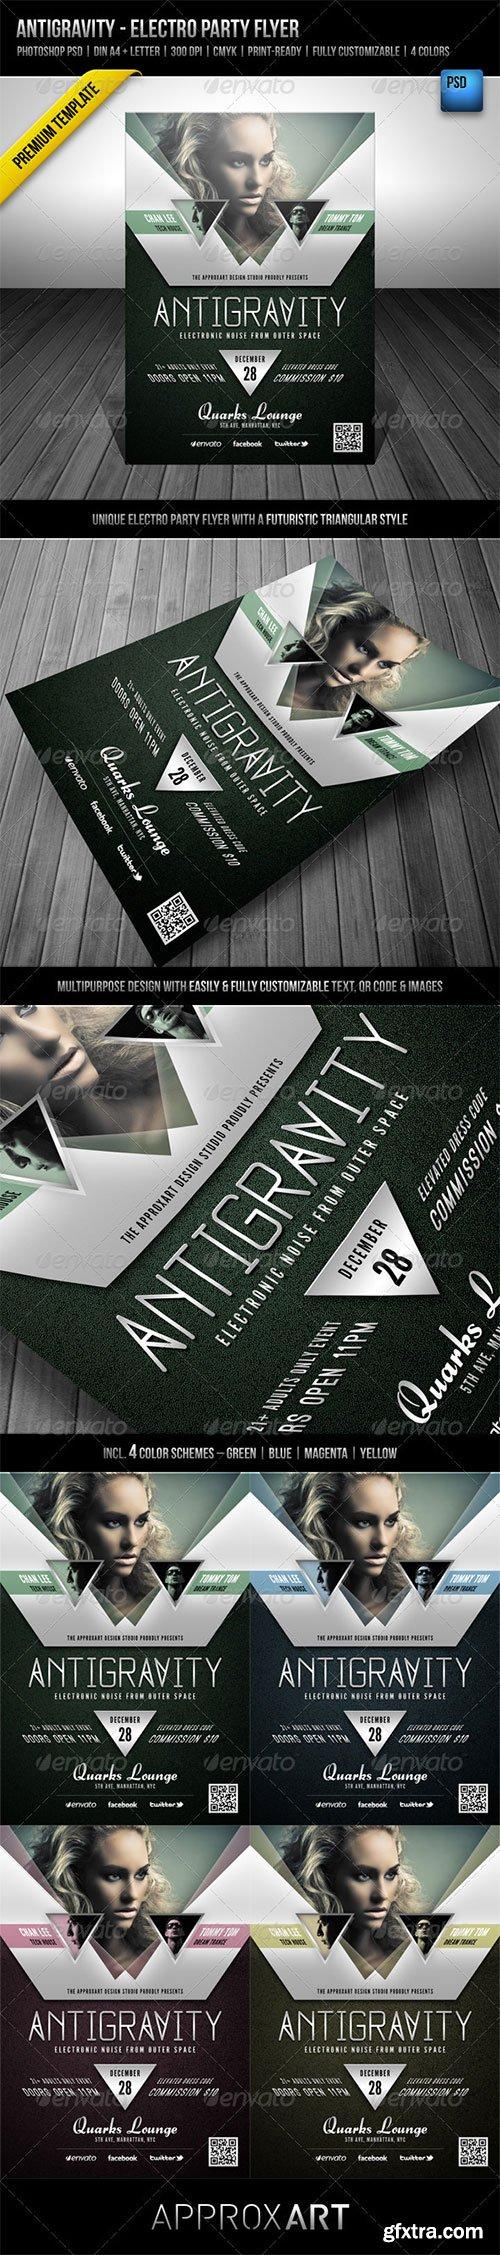 GraphicRiver: Antigravity - Electro Party Flyer